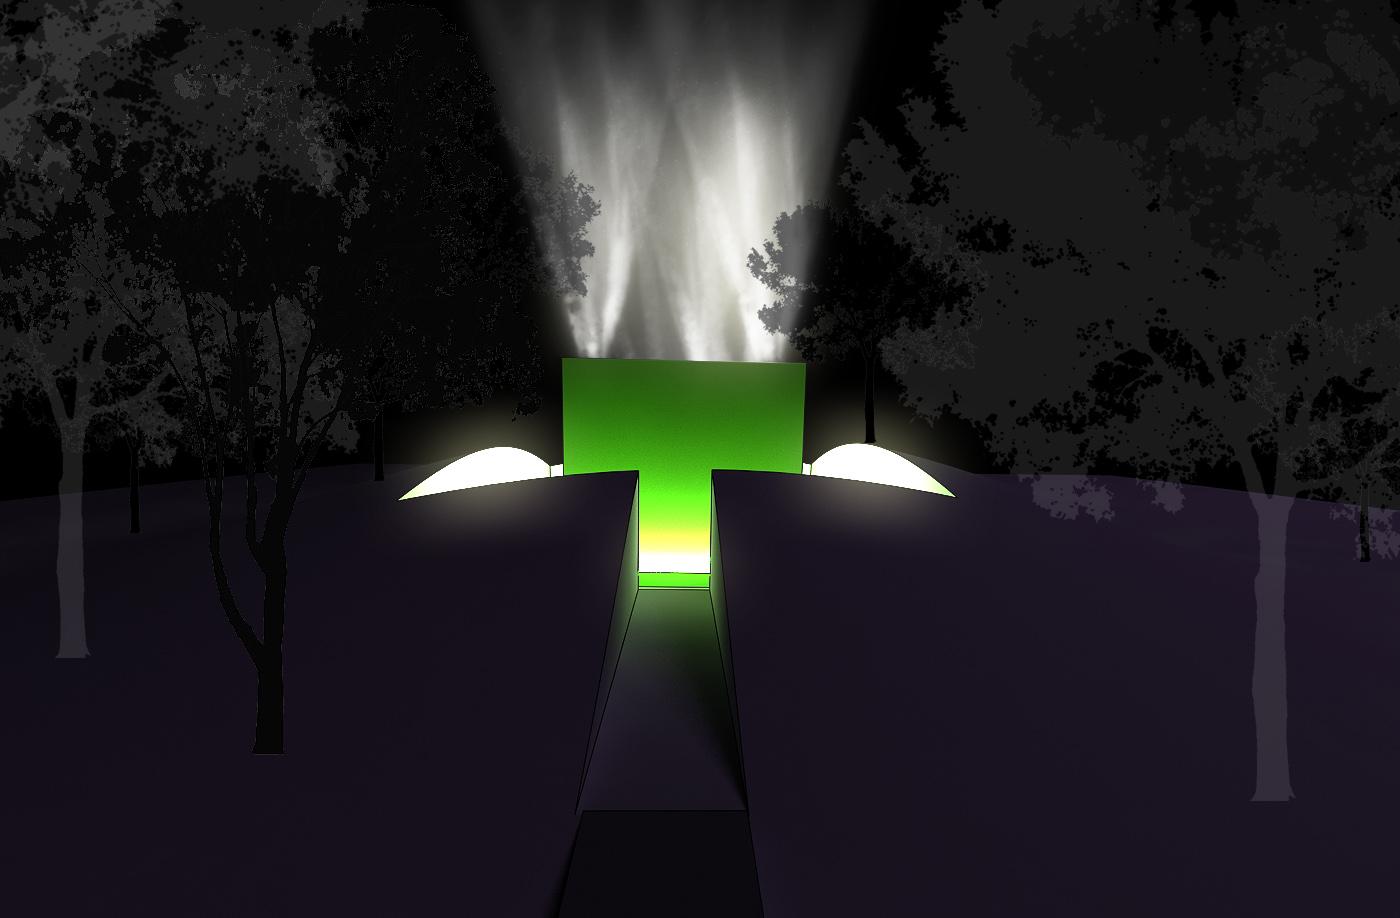 2014-6-10_test night box.jpg